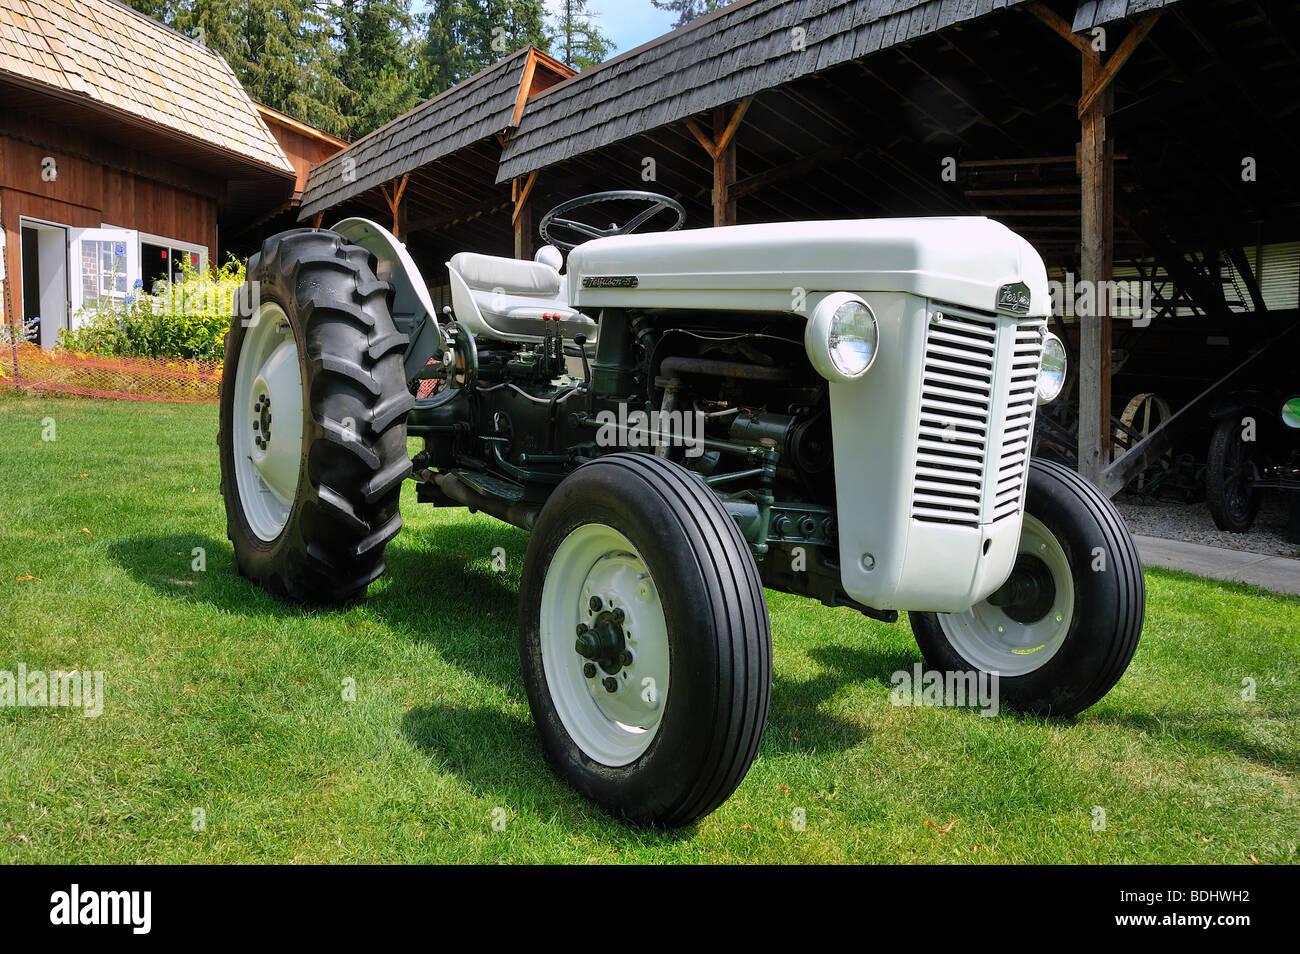 Antique Farm Tractor - Stock Image